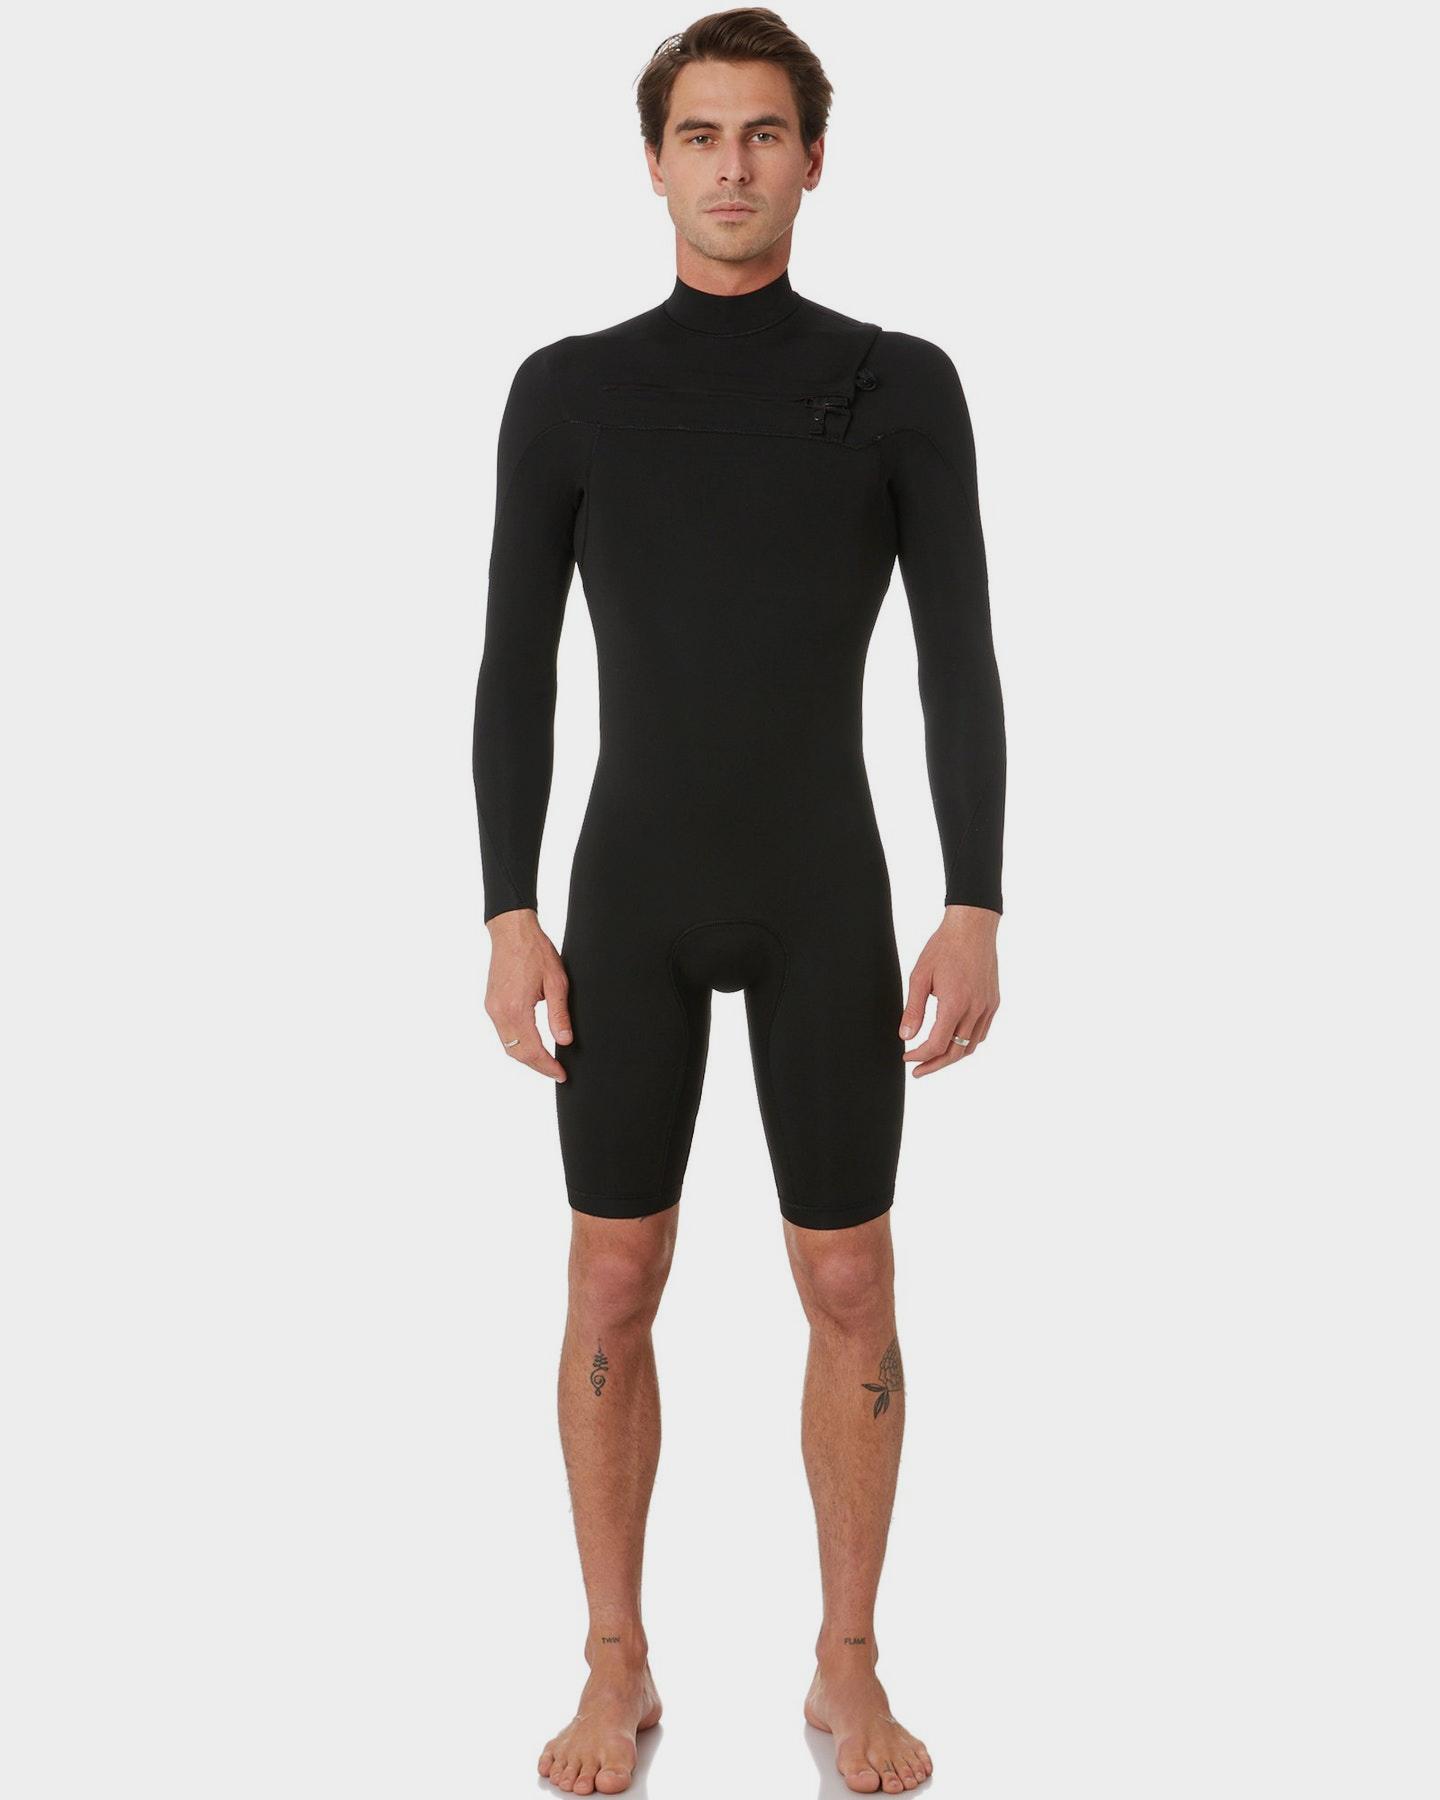 Project Blank Mens 2Mm High Performance L/S Springsuit Black